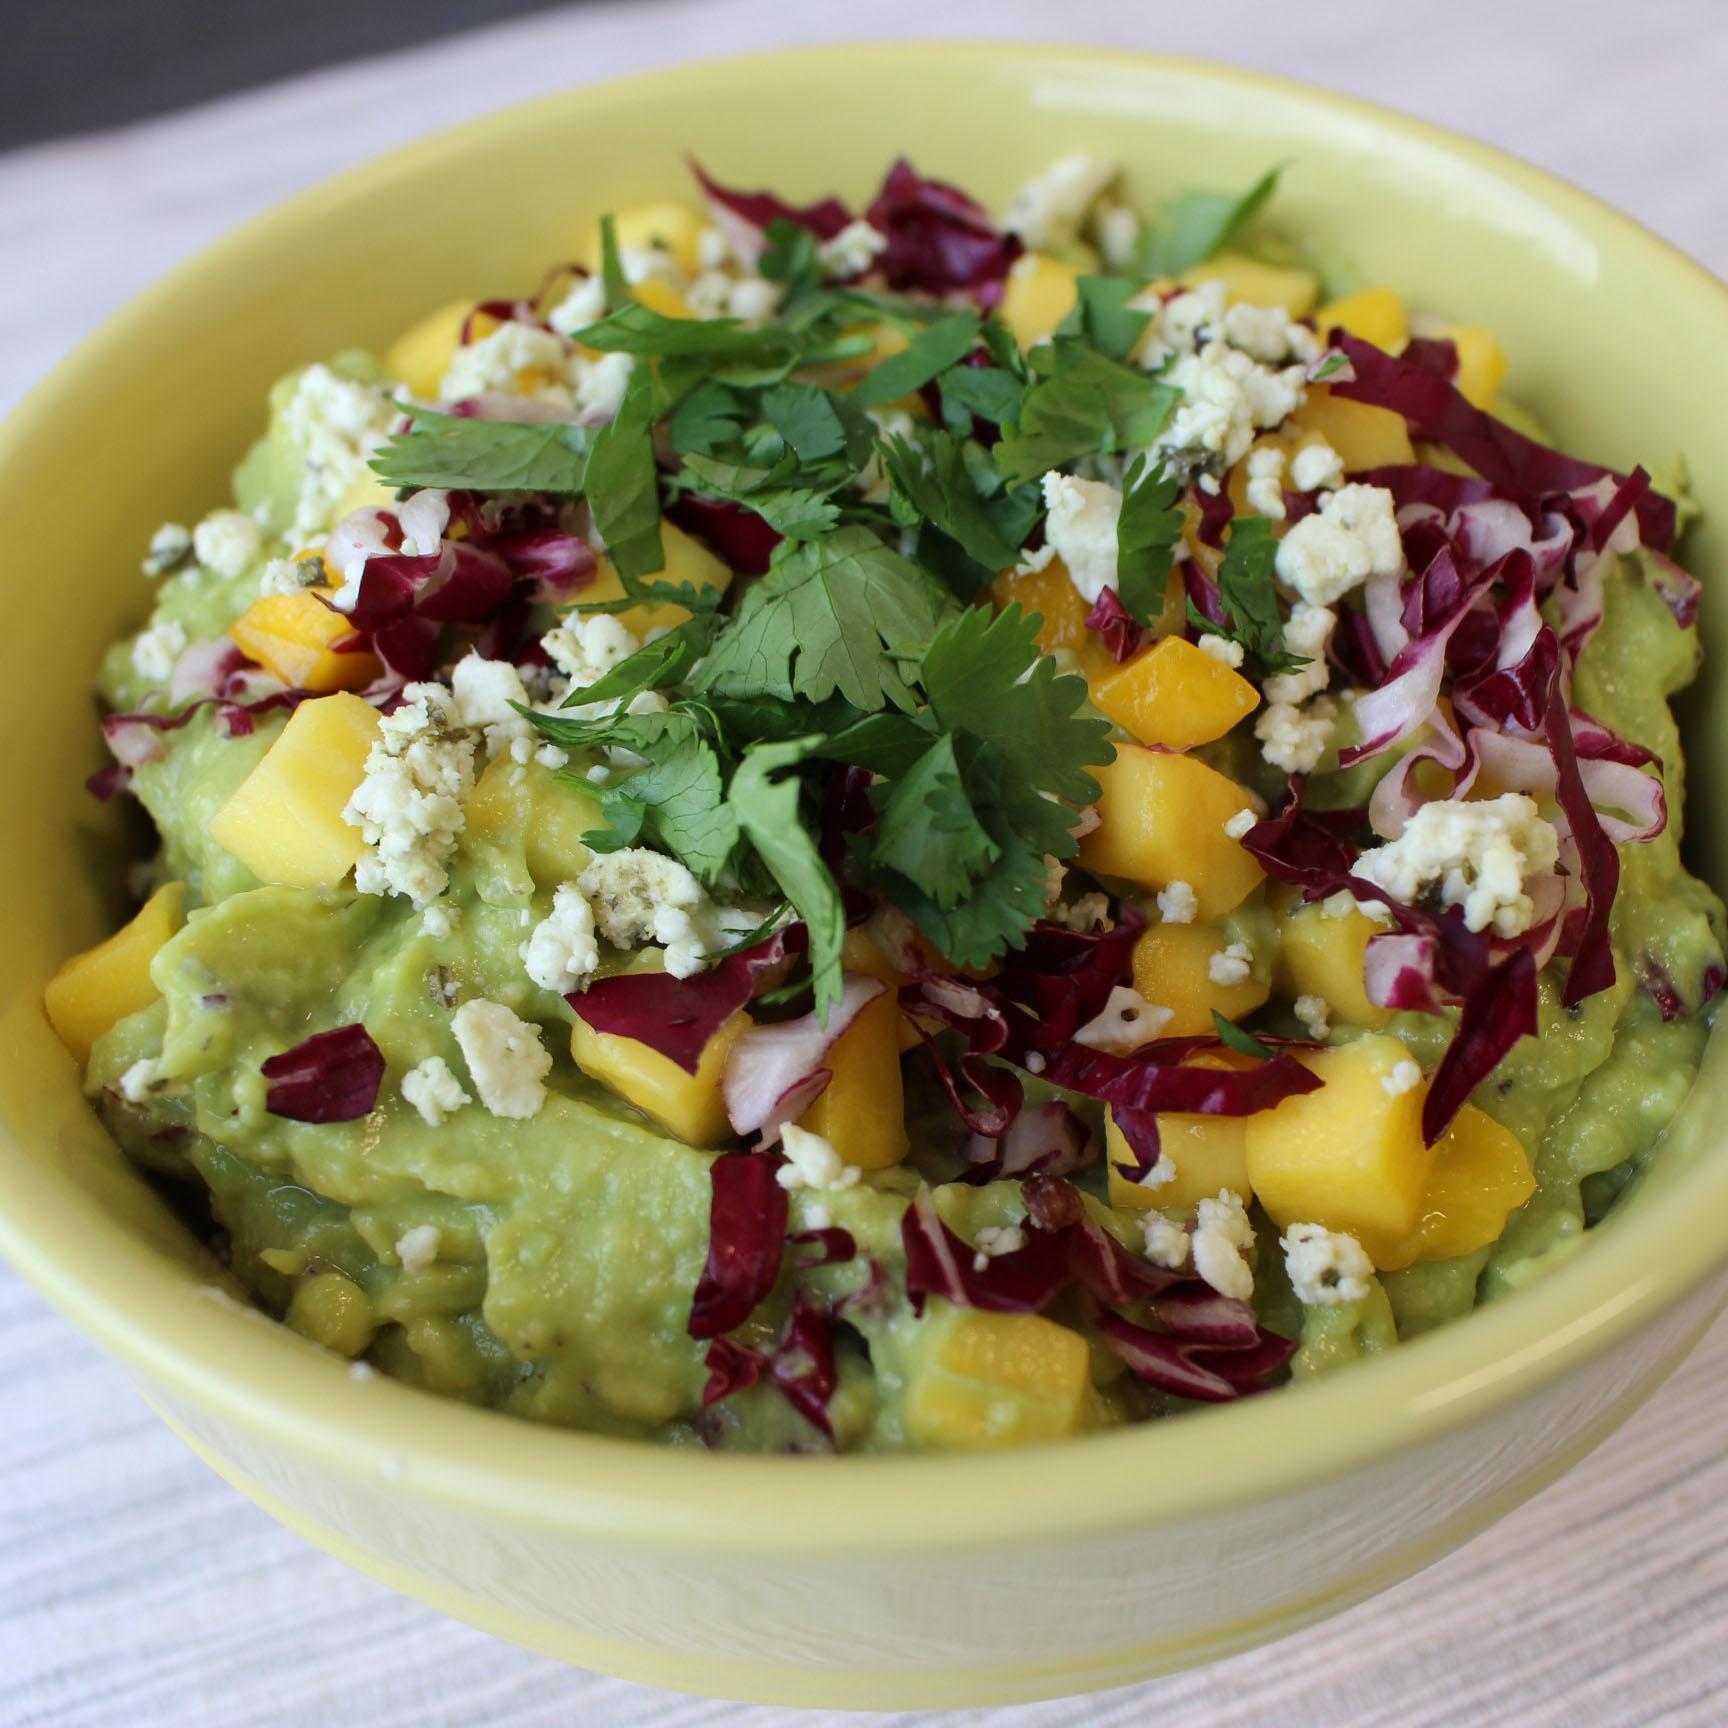 Avocado and Mango Mash Bowl